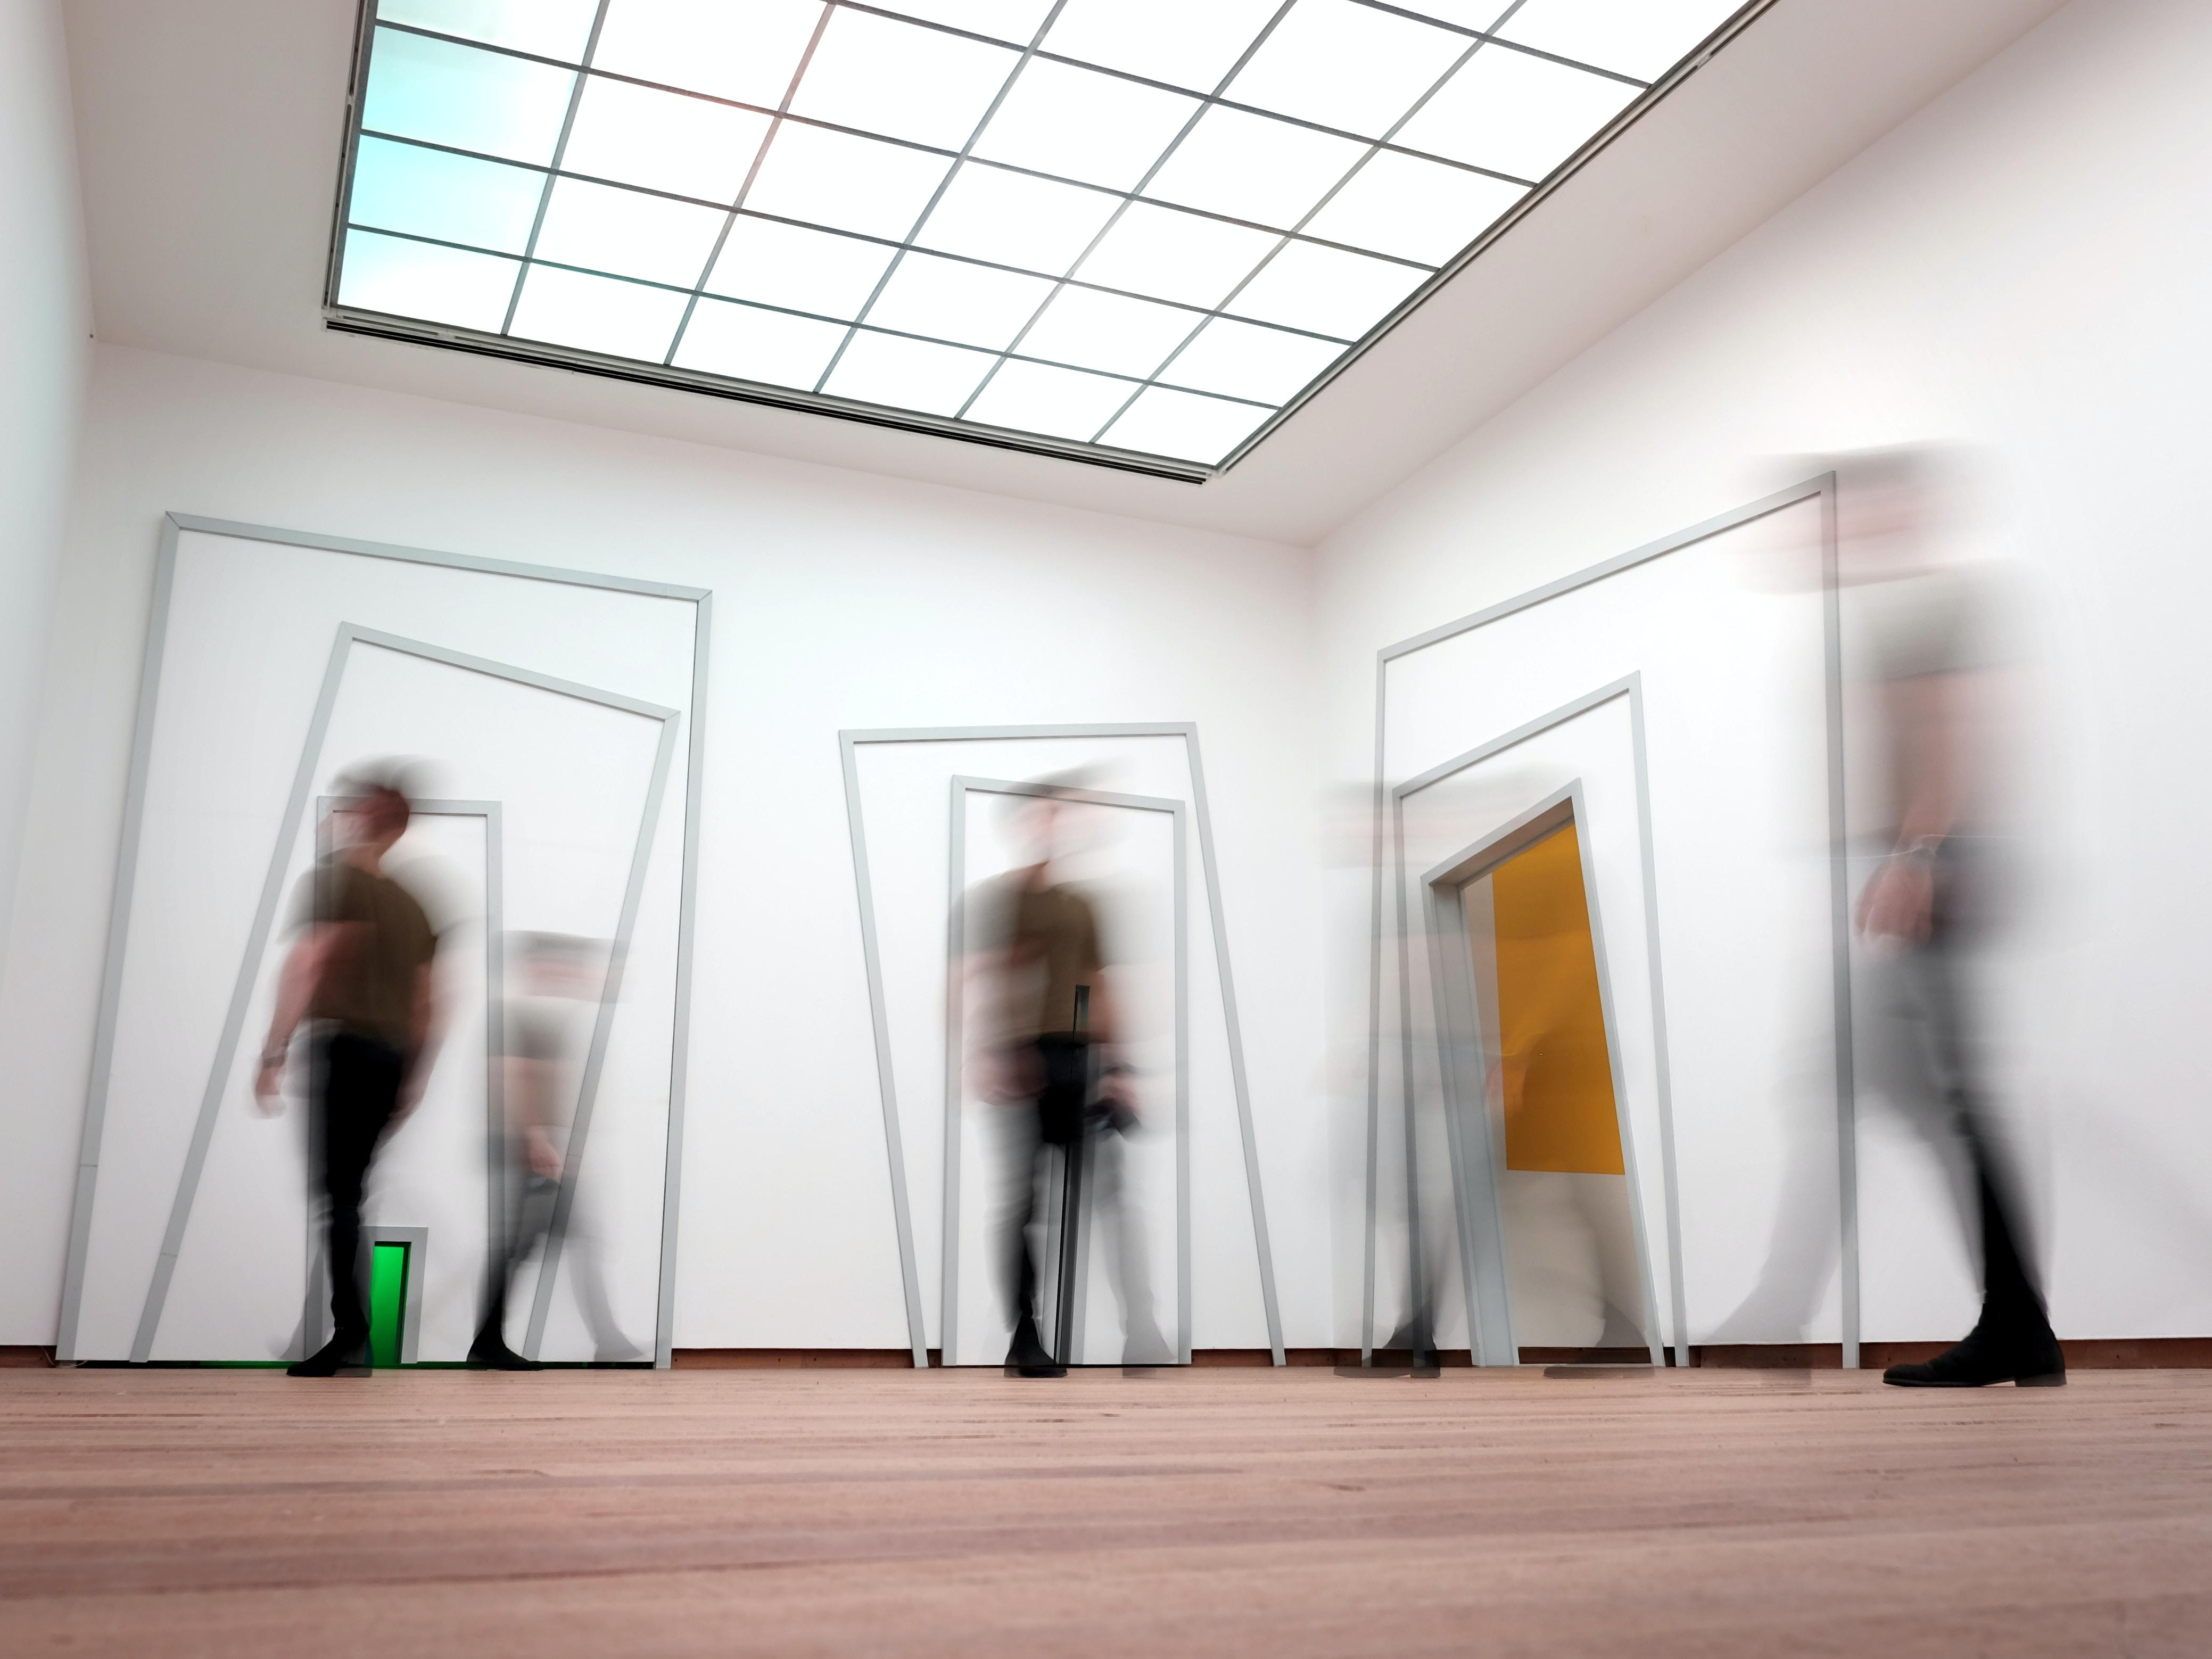 people standing inside room